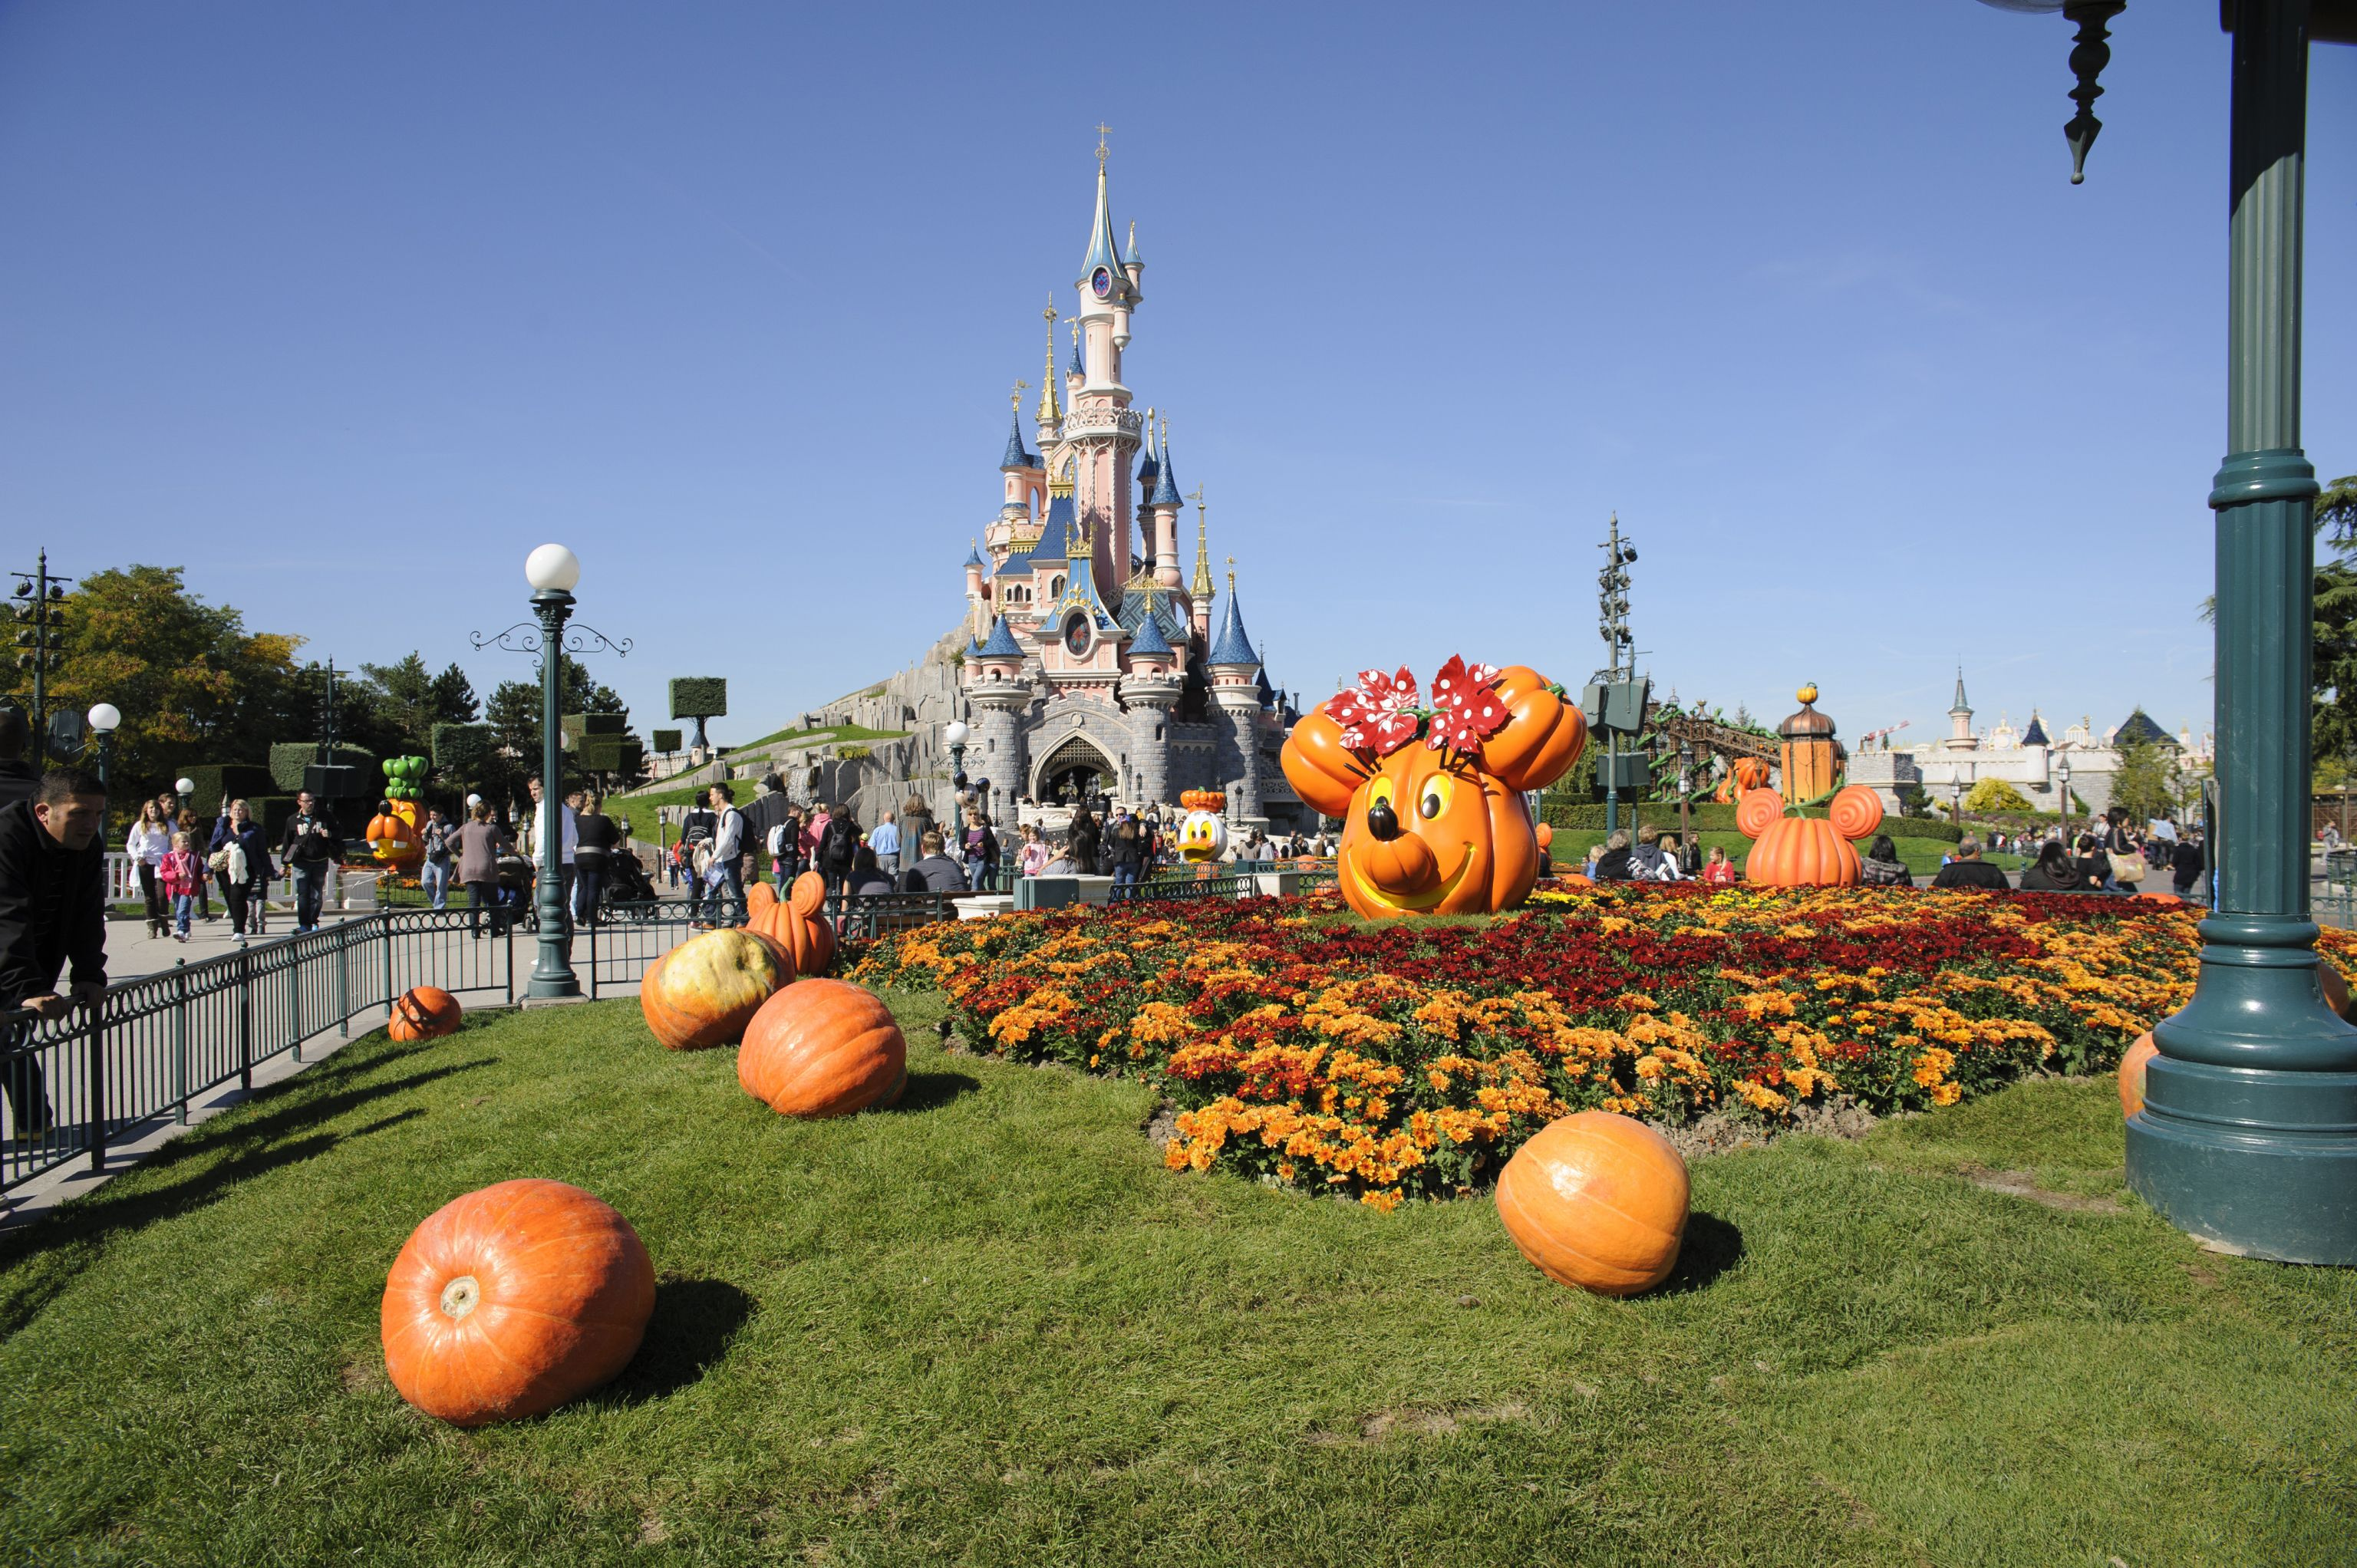 disneyland paris, disney's halloween festival - halloween pumpkins